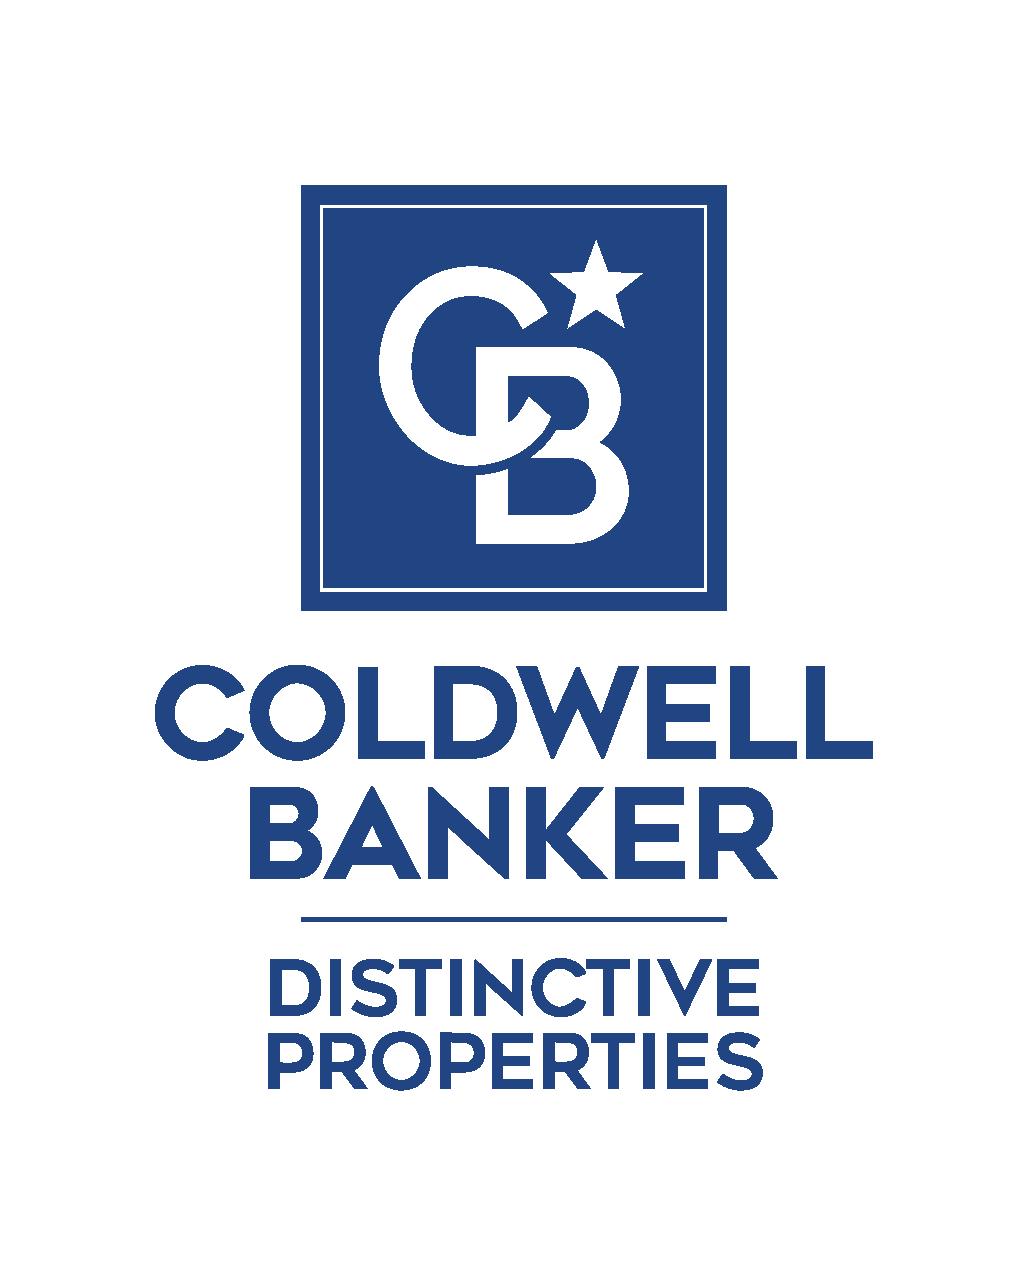 Makura Casias - Coldwell Banker Distinctive Properties Logo